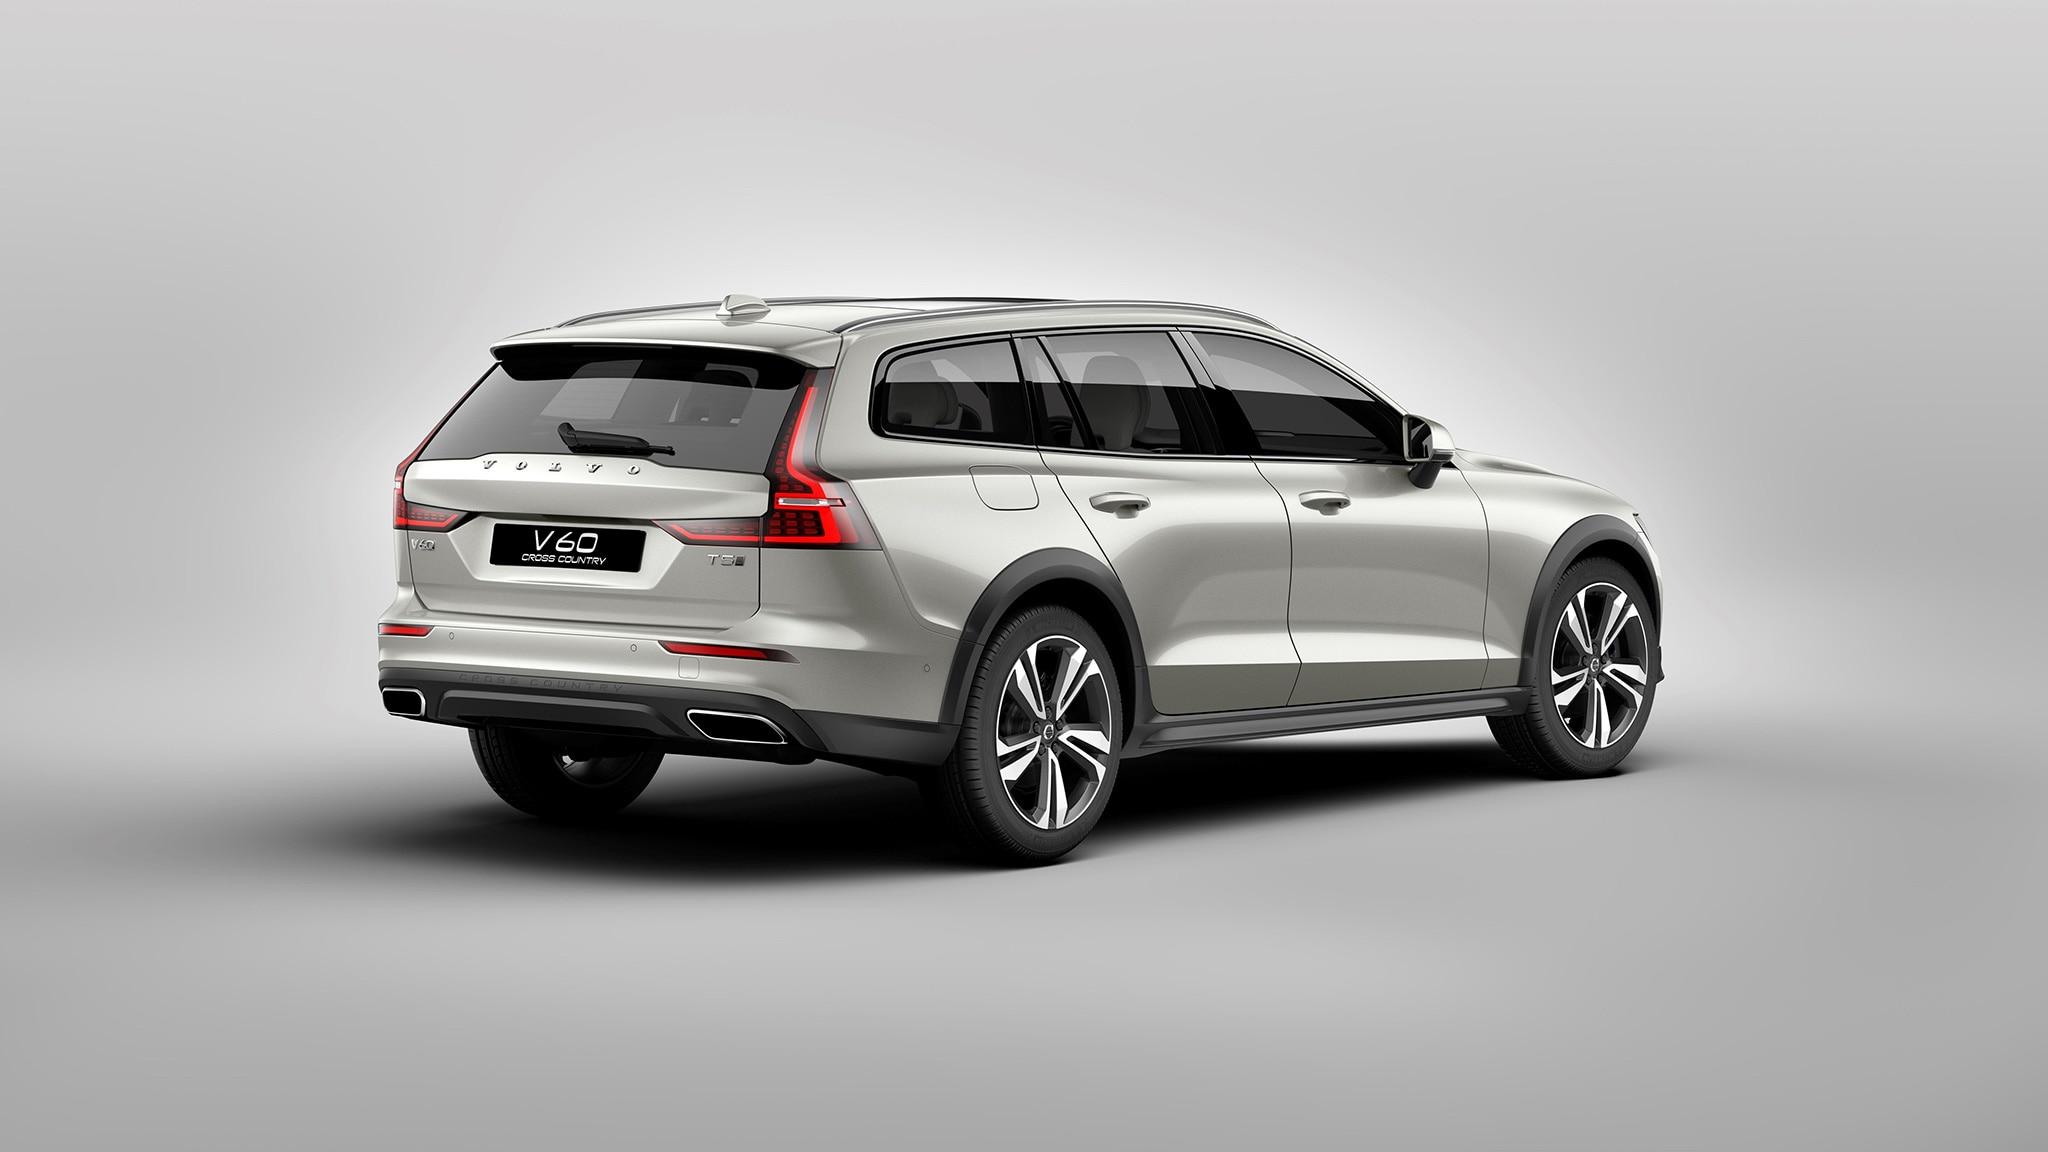 2020 Volvo XC70 Comeback News >> Bmw 3 Series Vs Volvo V60 An Informal Wagon Comparison